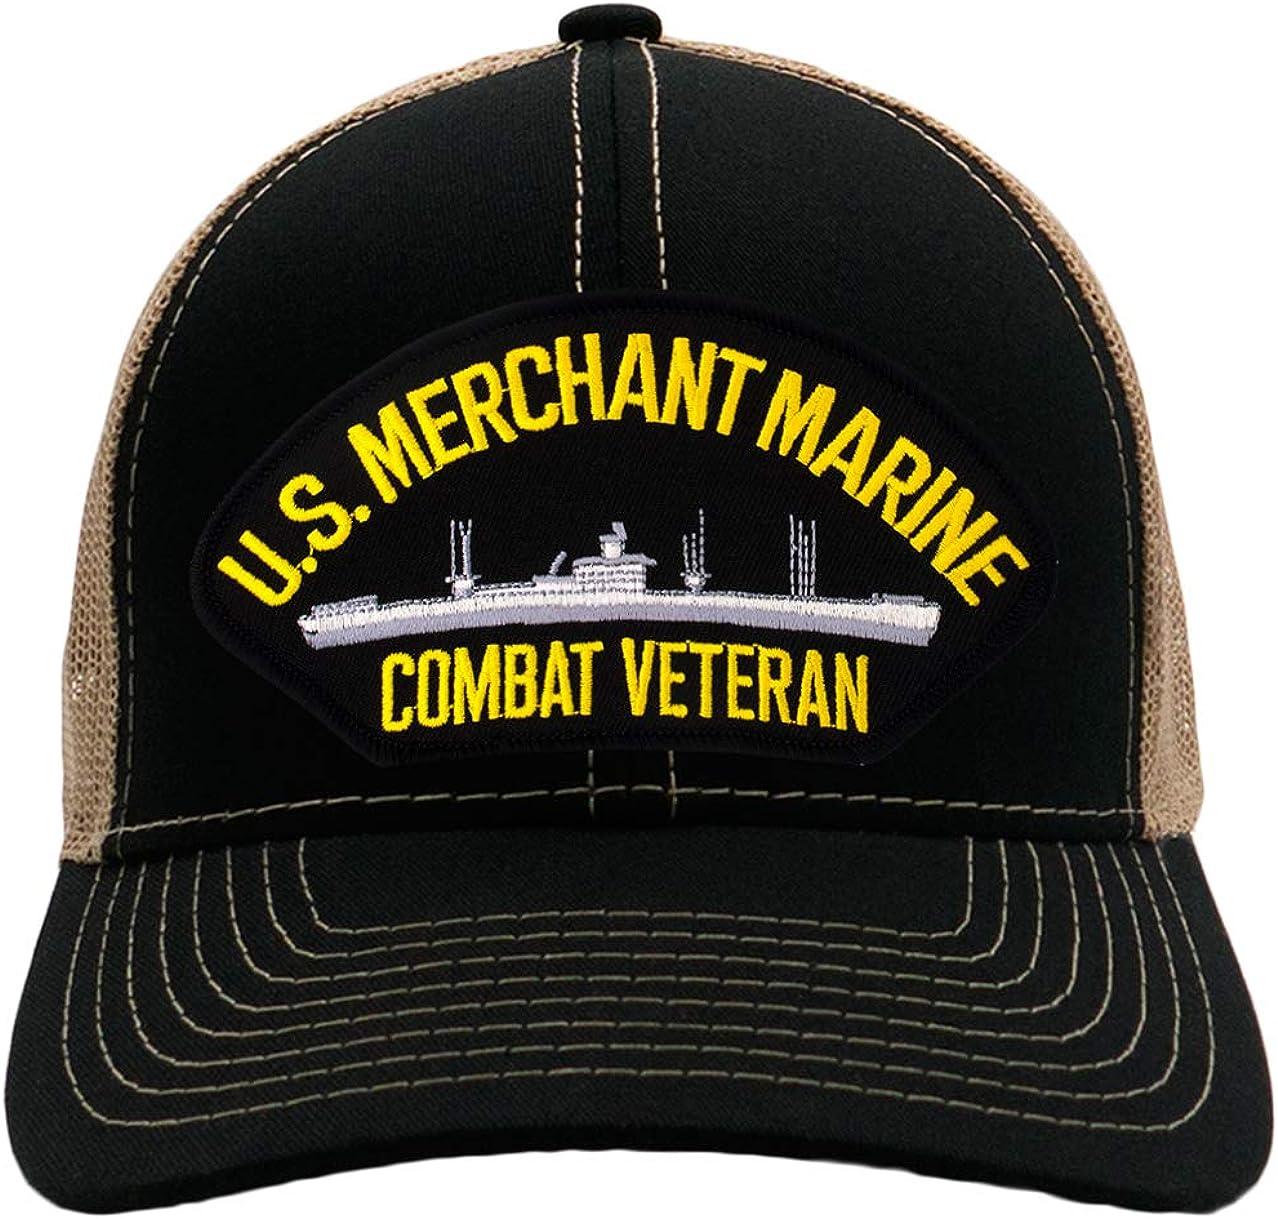 PATCHTOWN US Merchant Marine Combat Veteran Hat//Ballcap Adjustable One Size Fits Most